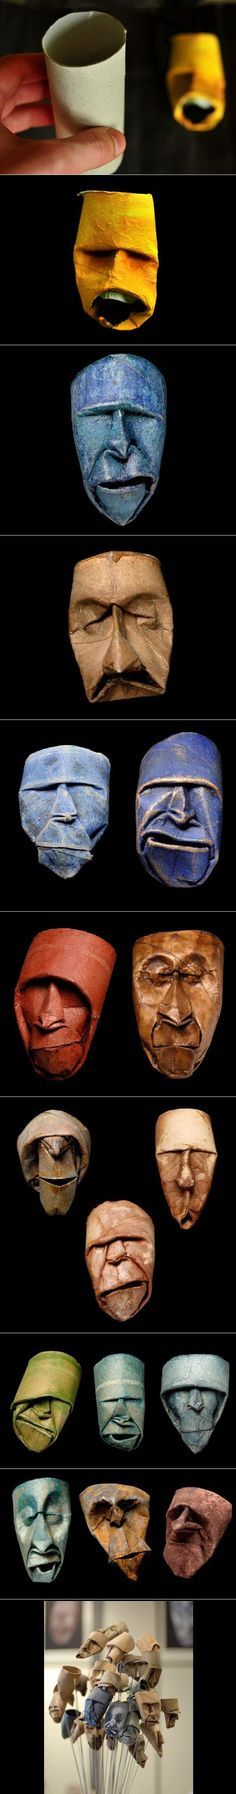 Geniale Masken aus Klopapierrollen - Win Bild | Webfail - Fail Bilder und Fail Videos